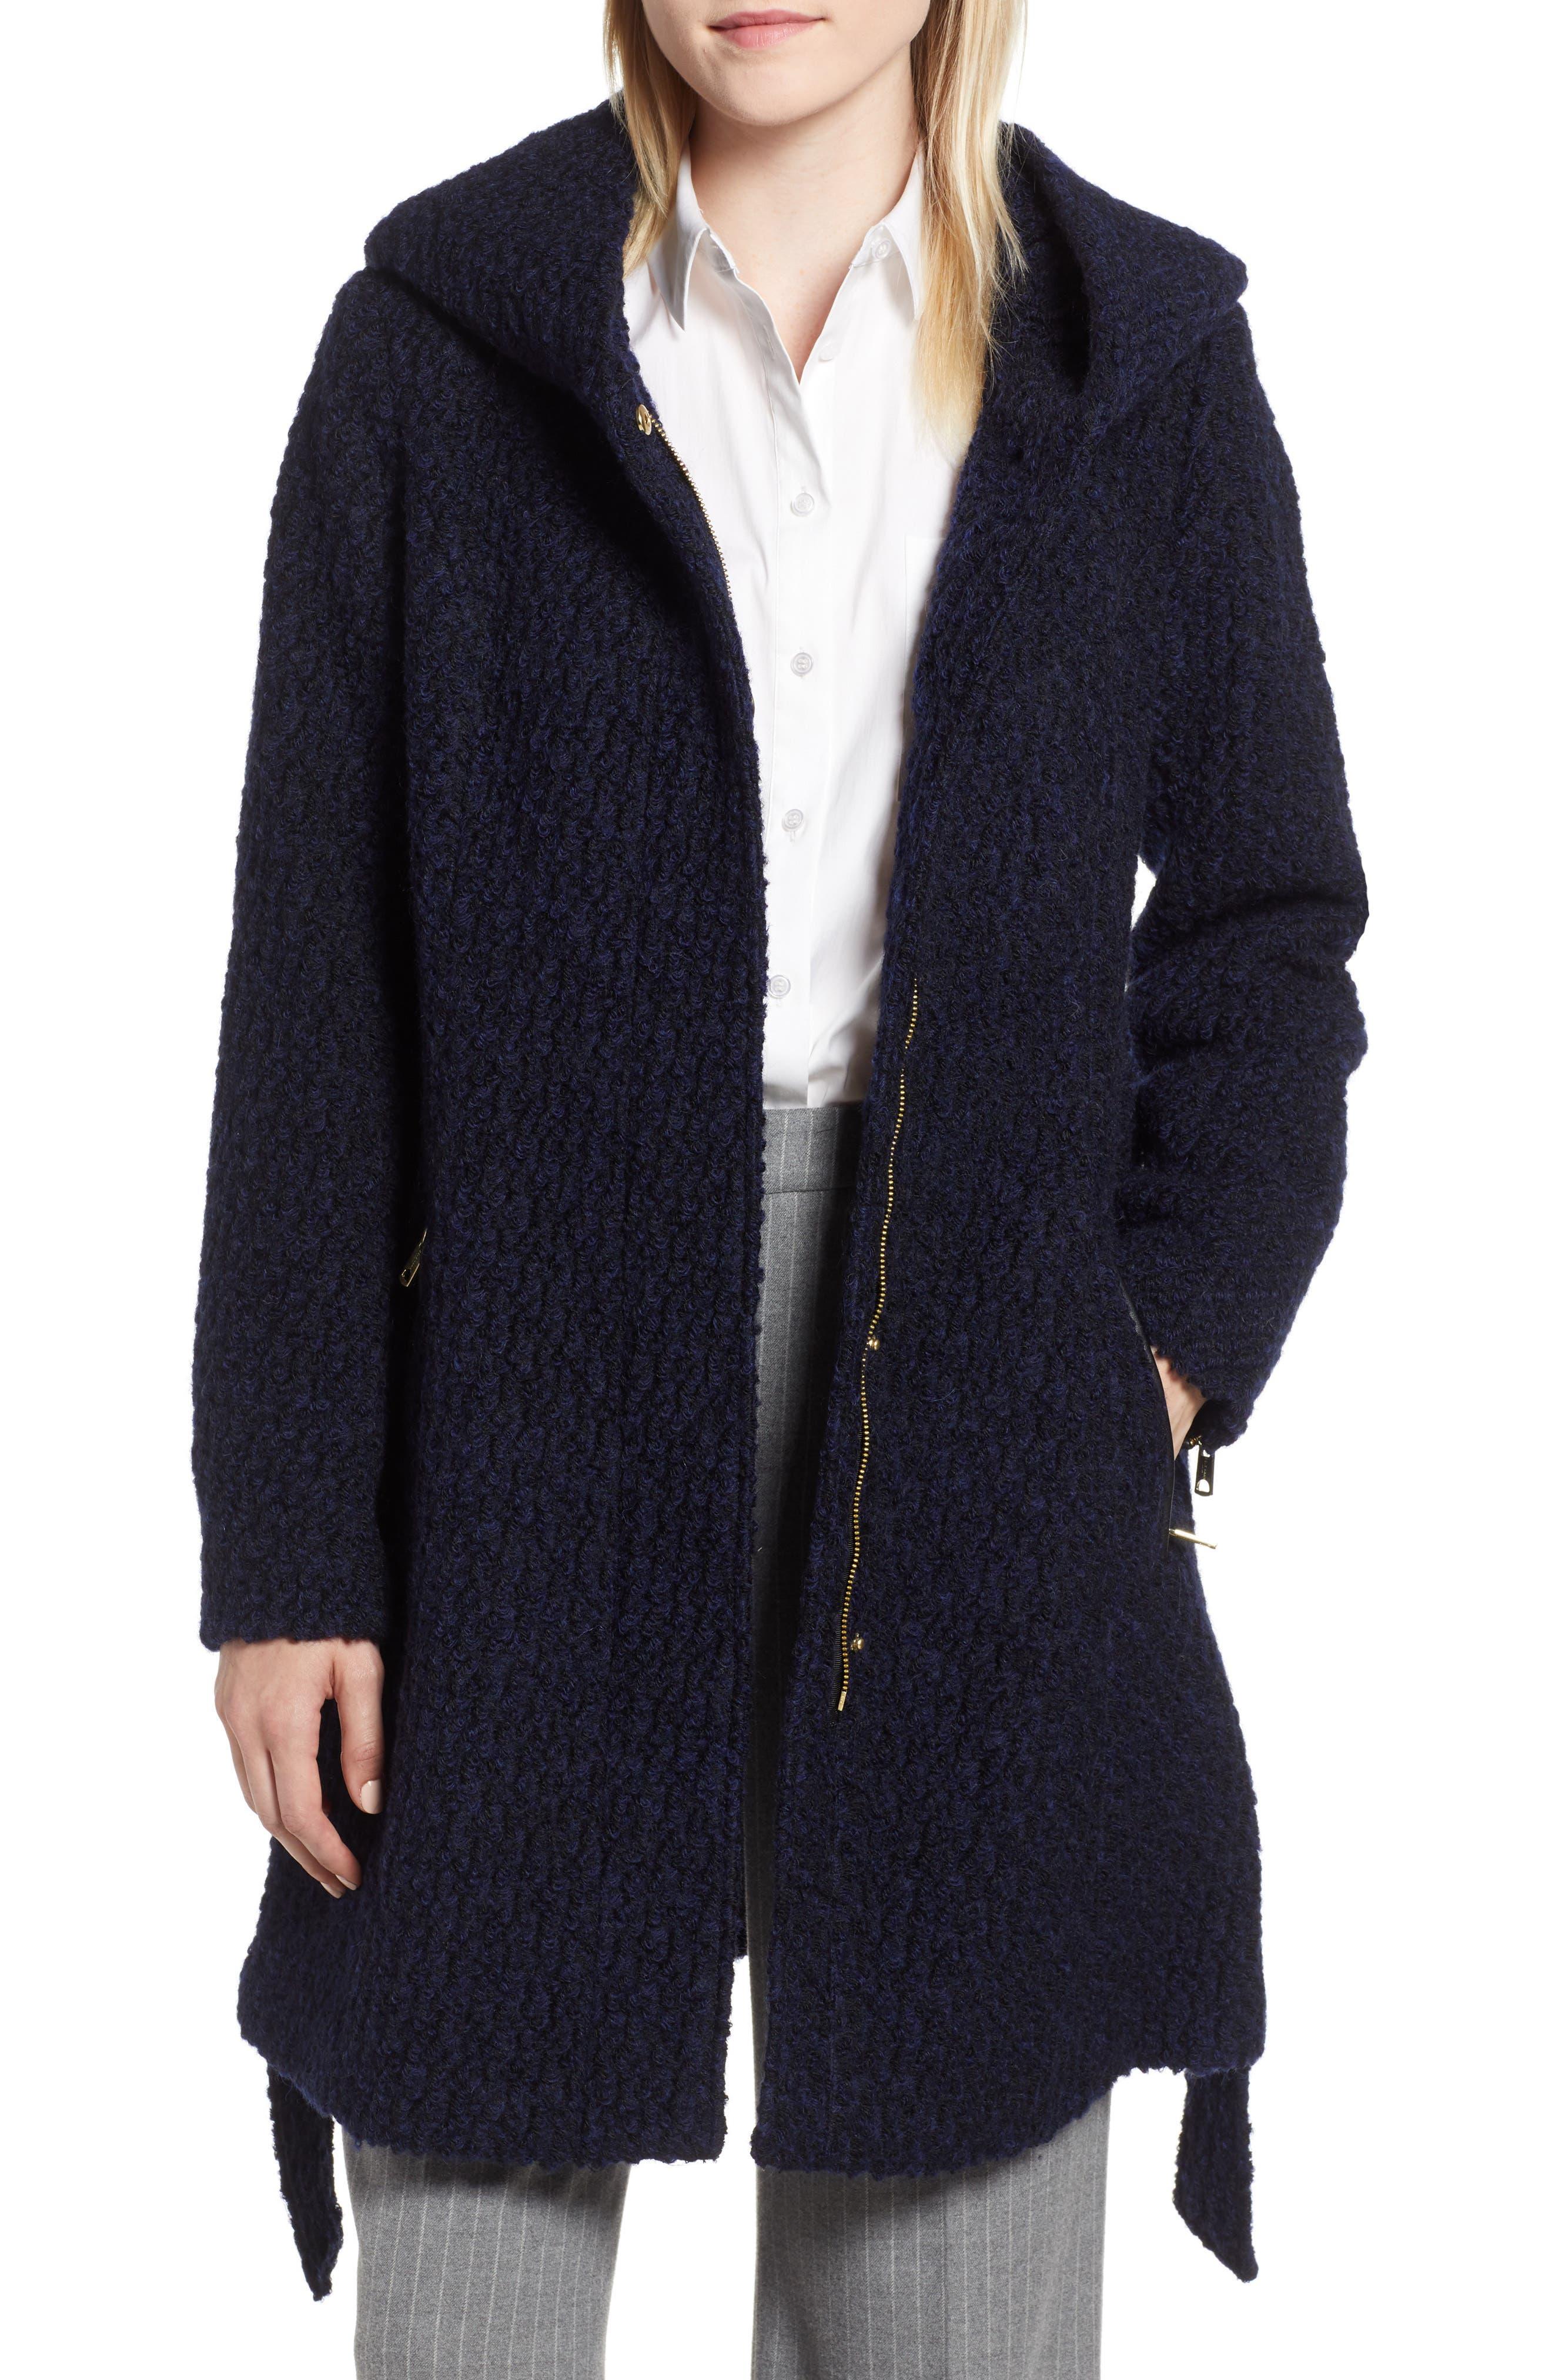 Belted Bouclé Wool Blend Coat, Main, color, BLACK/ NAVY